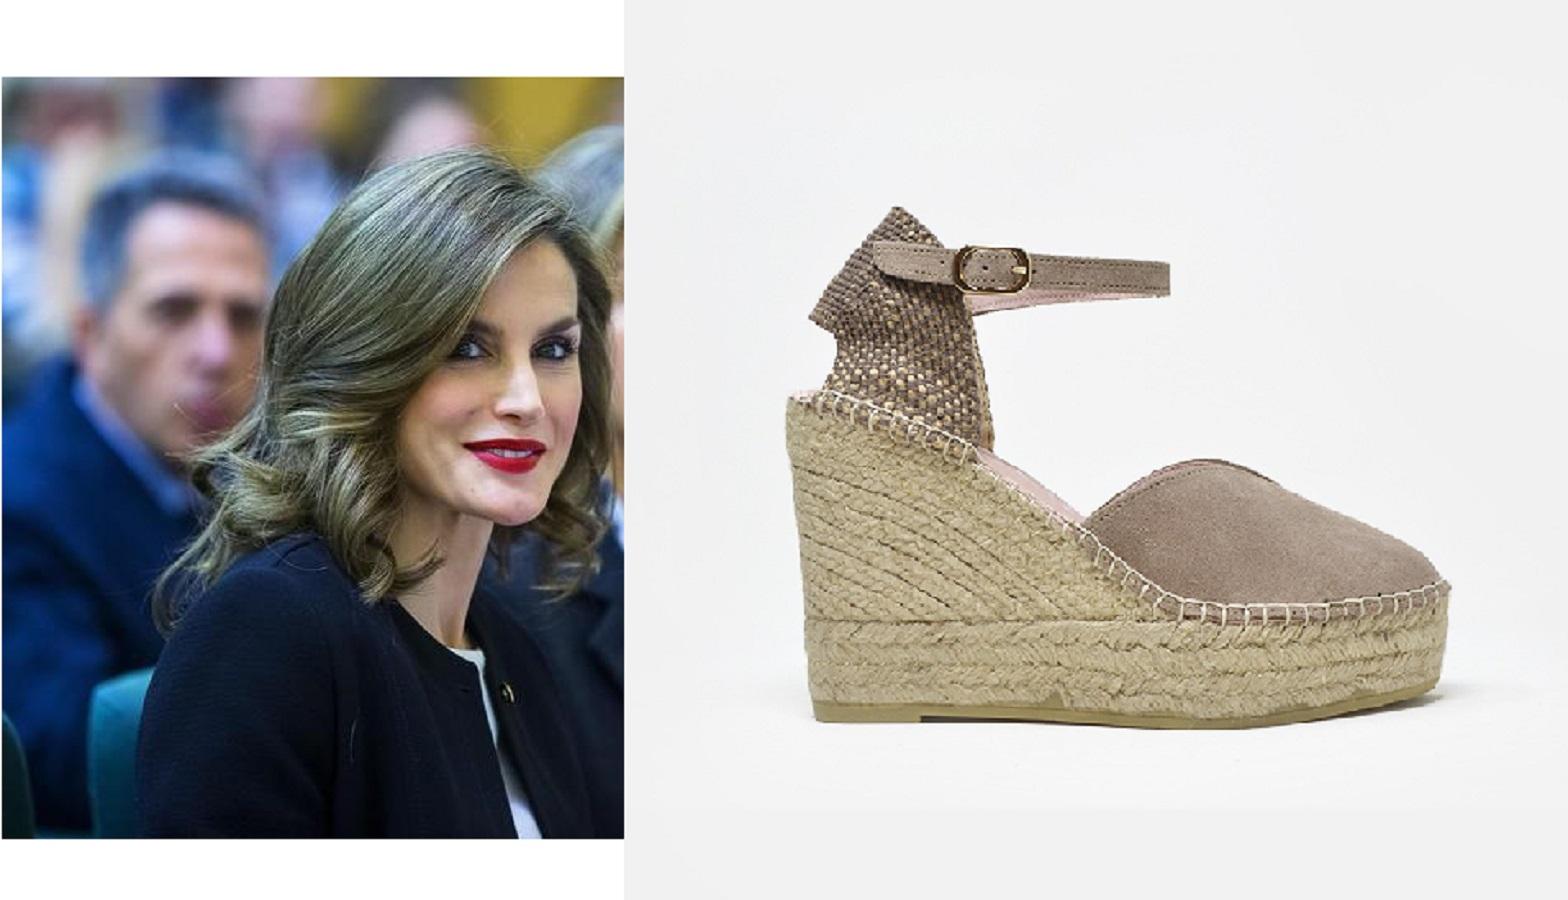 Letizia Ortiz con le espadrillas Macarena: dove comprarle